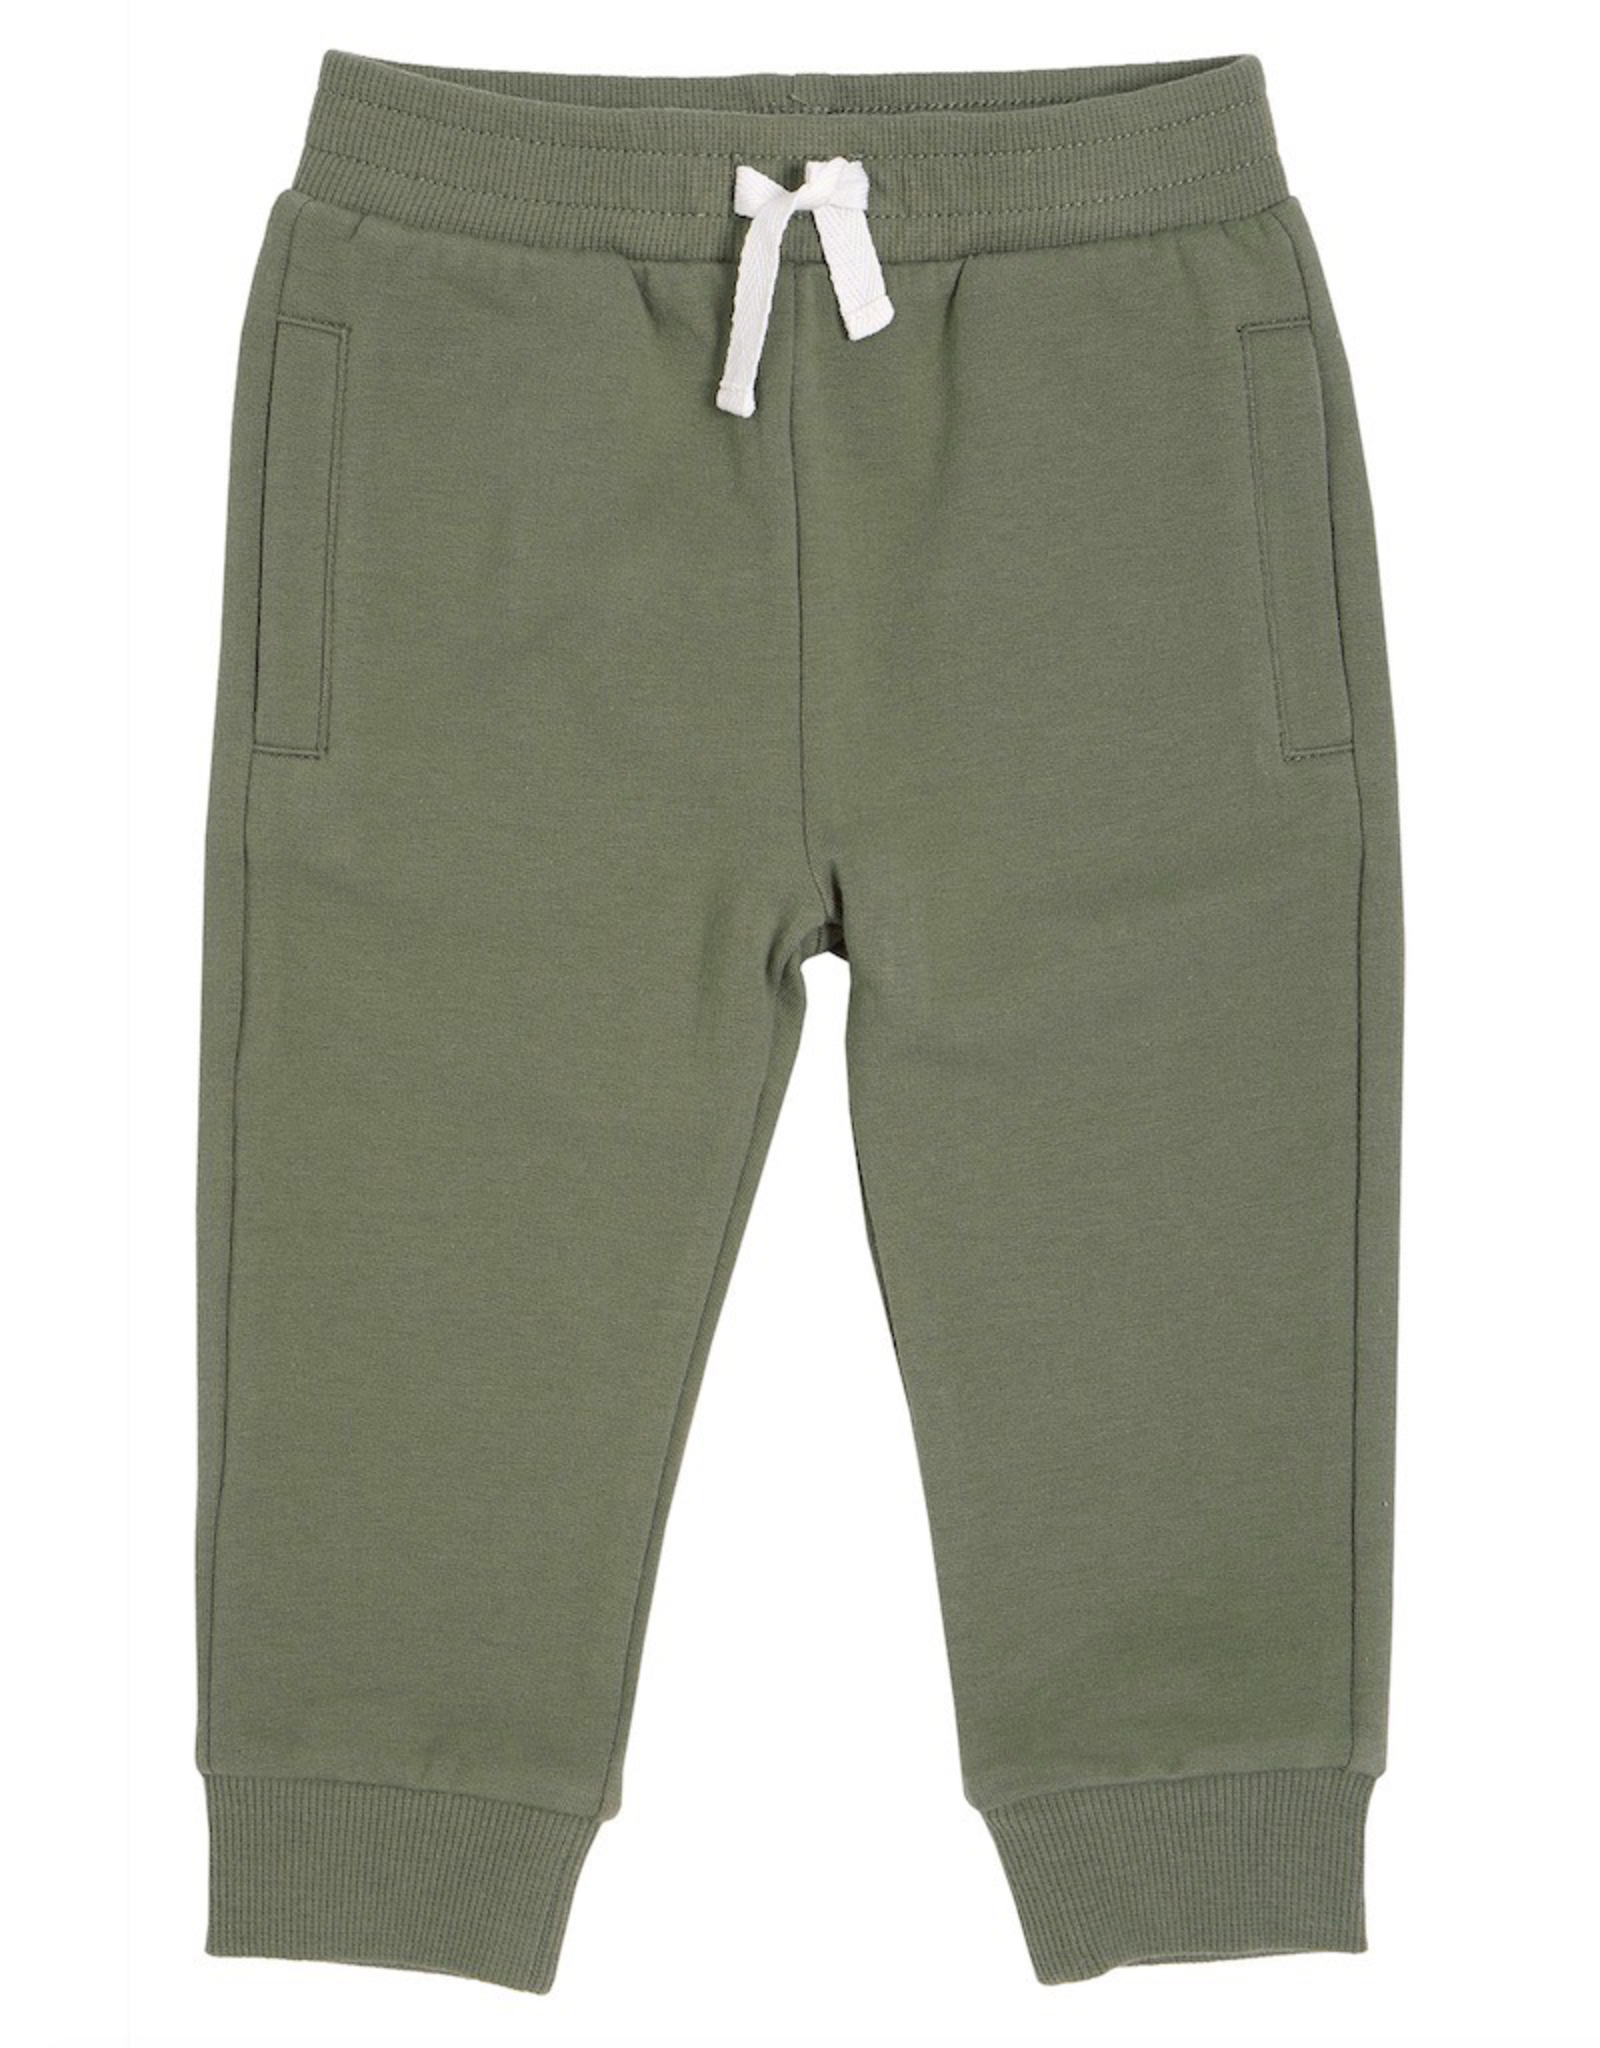 Unisex Pant Knit, Khaki